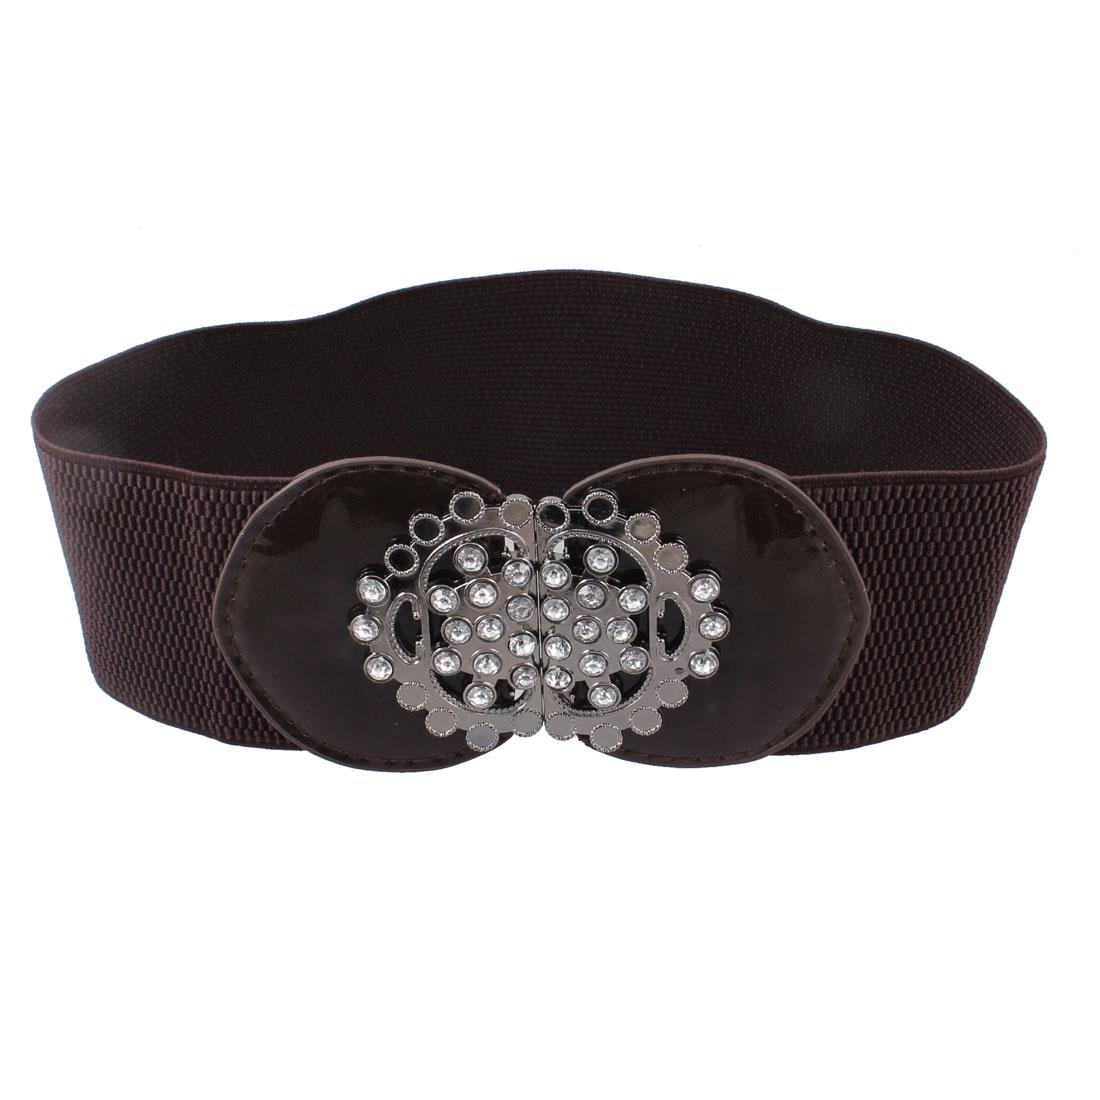 Ladies Metal Floral Accent Interlocking Buckle Elastic Blouse Belt Coffee Color